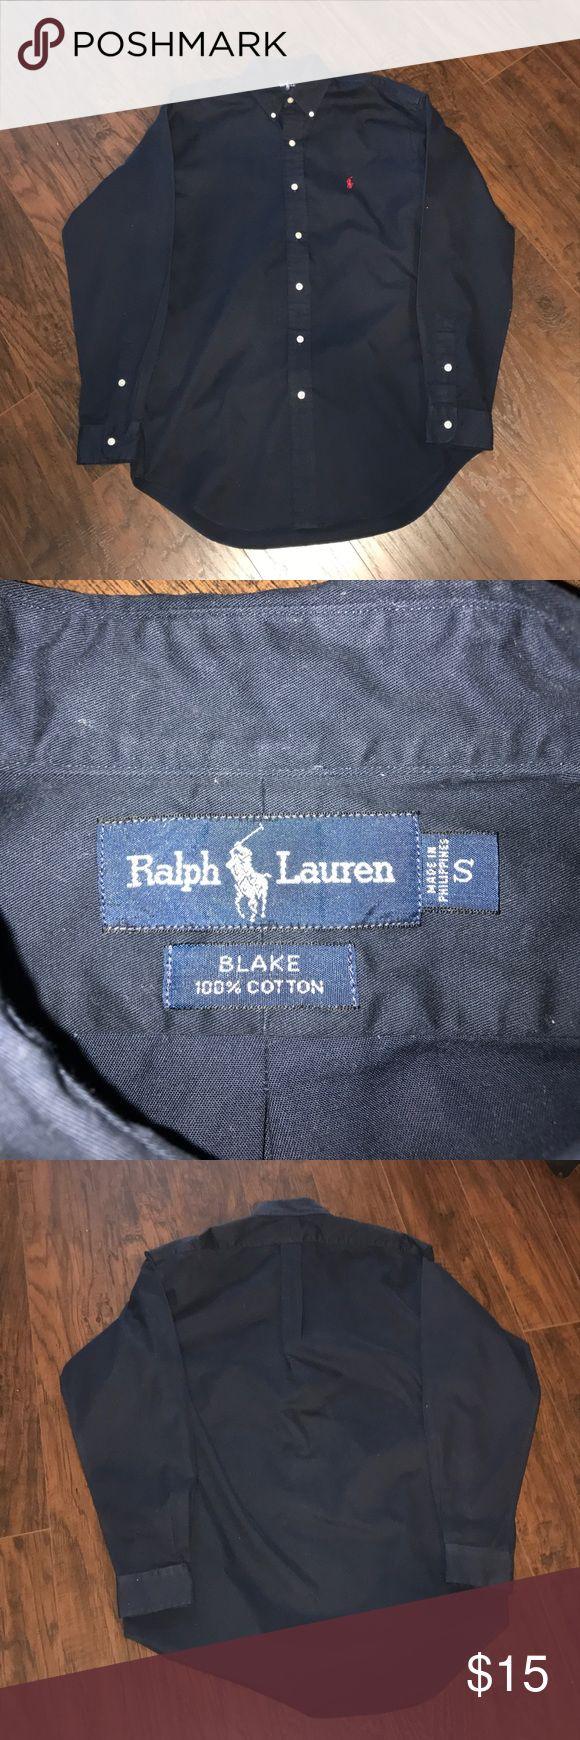 Polo Ralph Lauren Navy Button Down Size small. GUC Polo Ralph Lauren Navy Button Down Size small. GUC Polo by Ralph Lauren Shirts